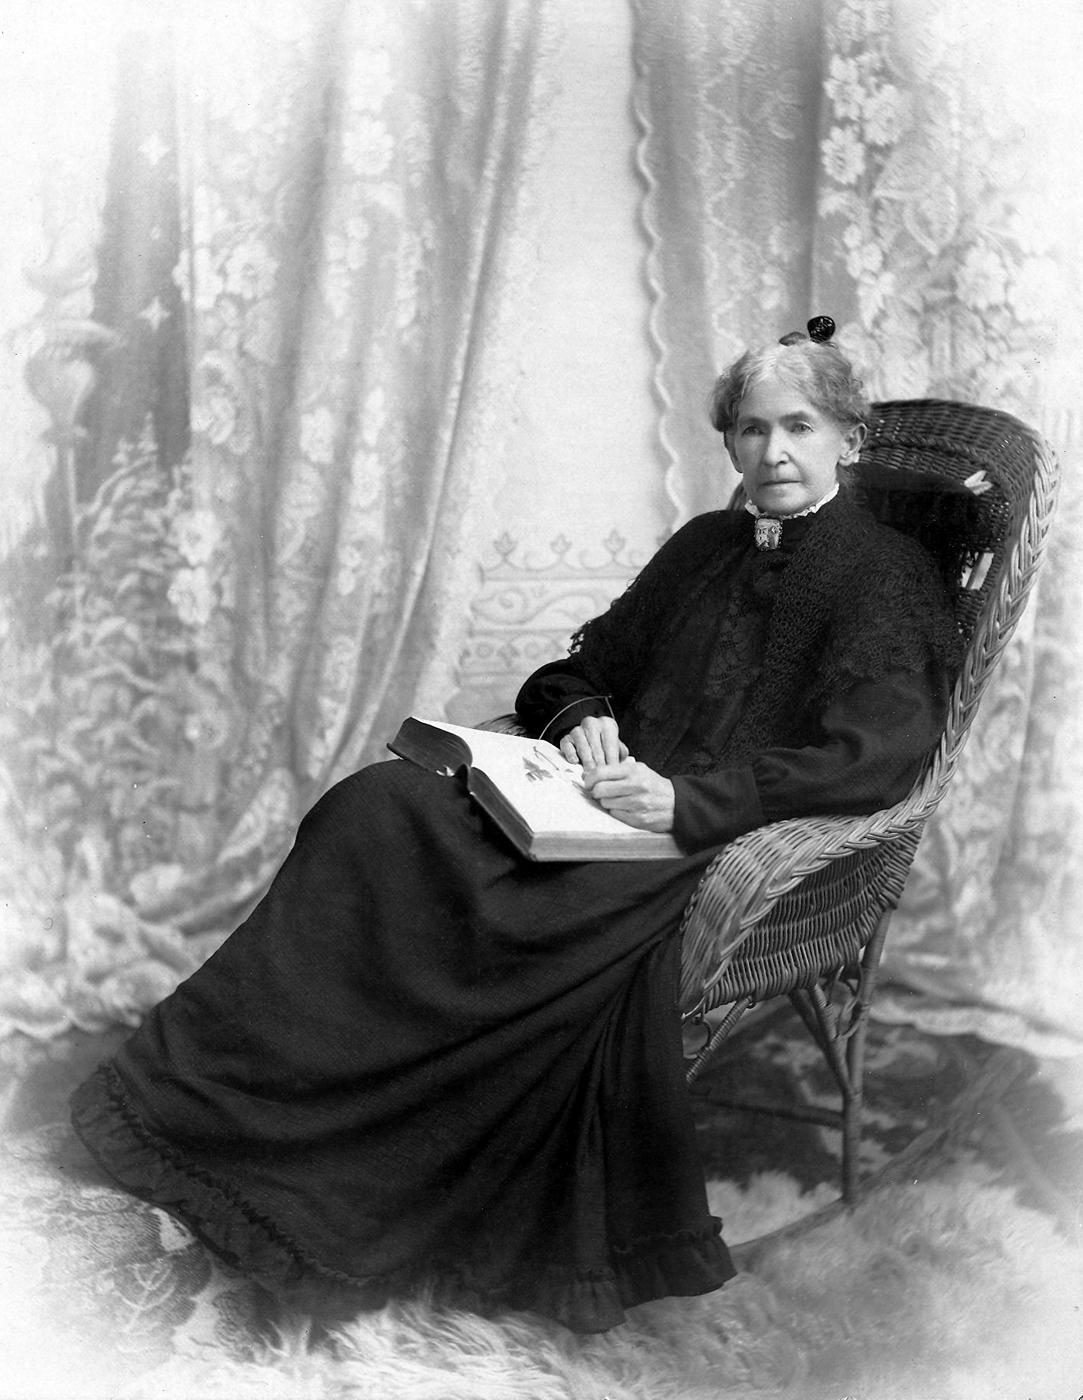 Mary Elizabeth Austin Roeder, namesake of Elizabeth Park. photo: Beverly B. Dobbs, Whatcom Museum #1951.30.19